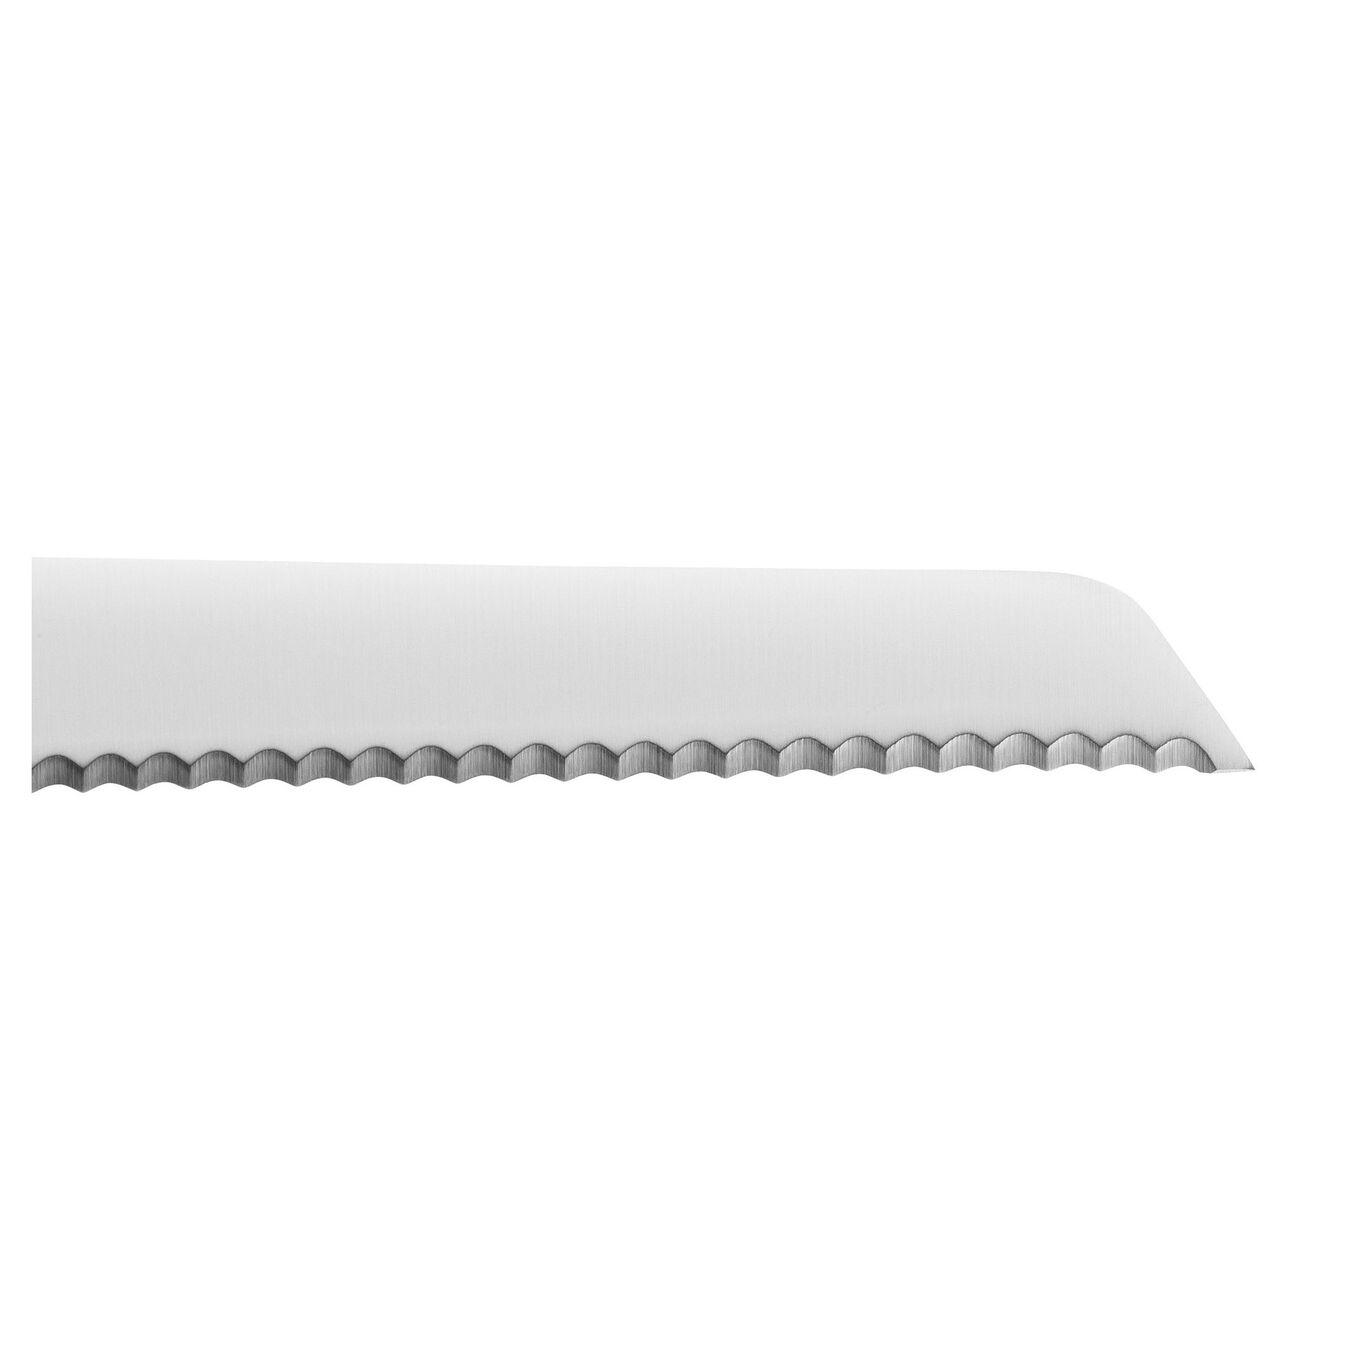 Brotmesser 20 cm, (keine spezielle Farbe), Kunststoff,,large 3